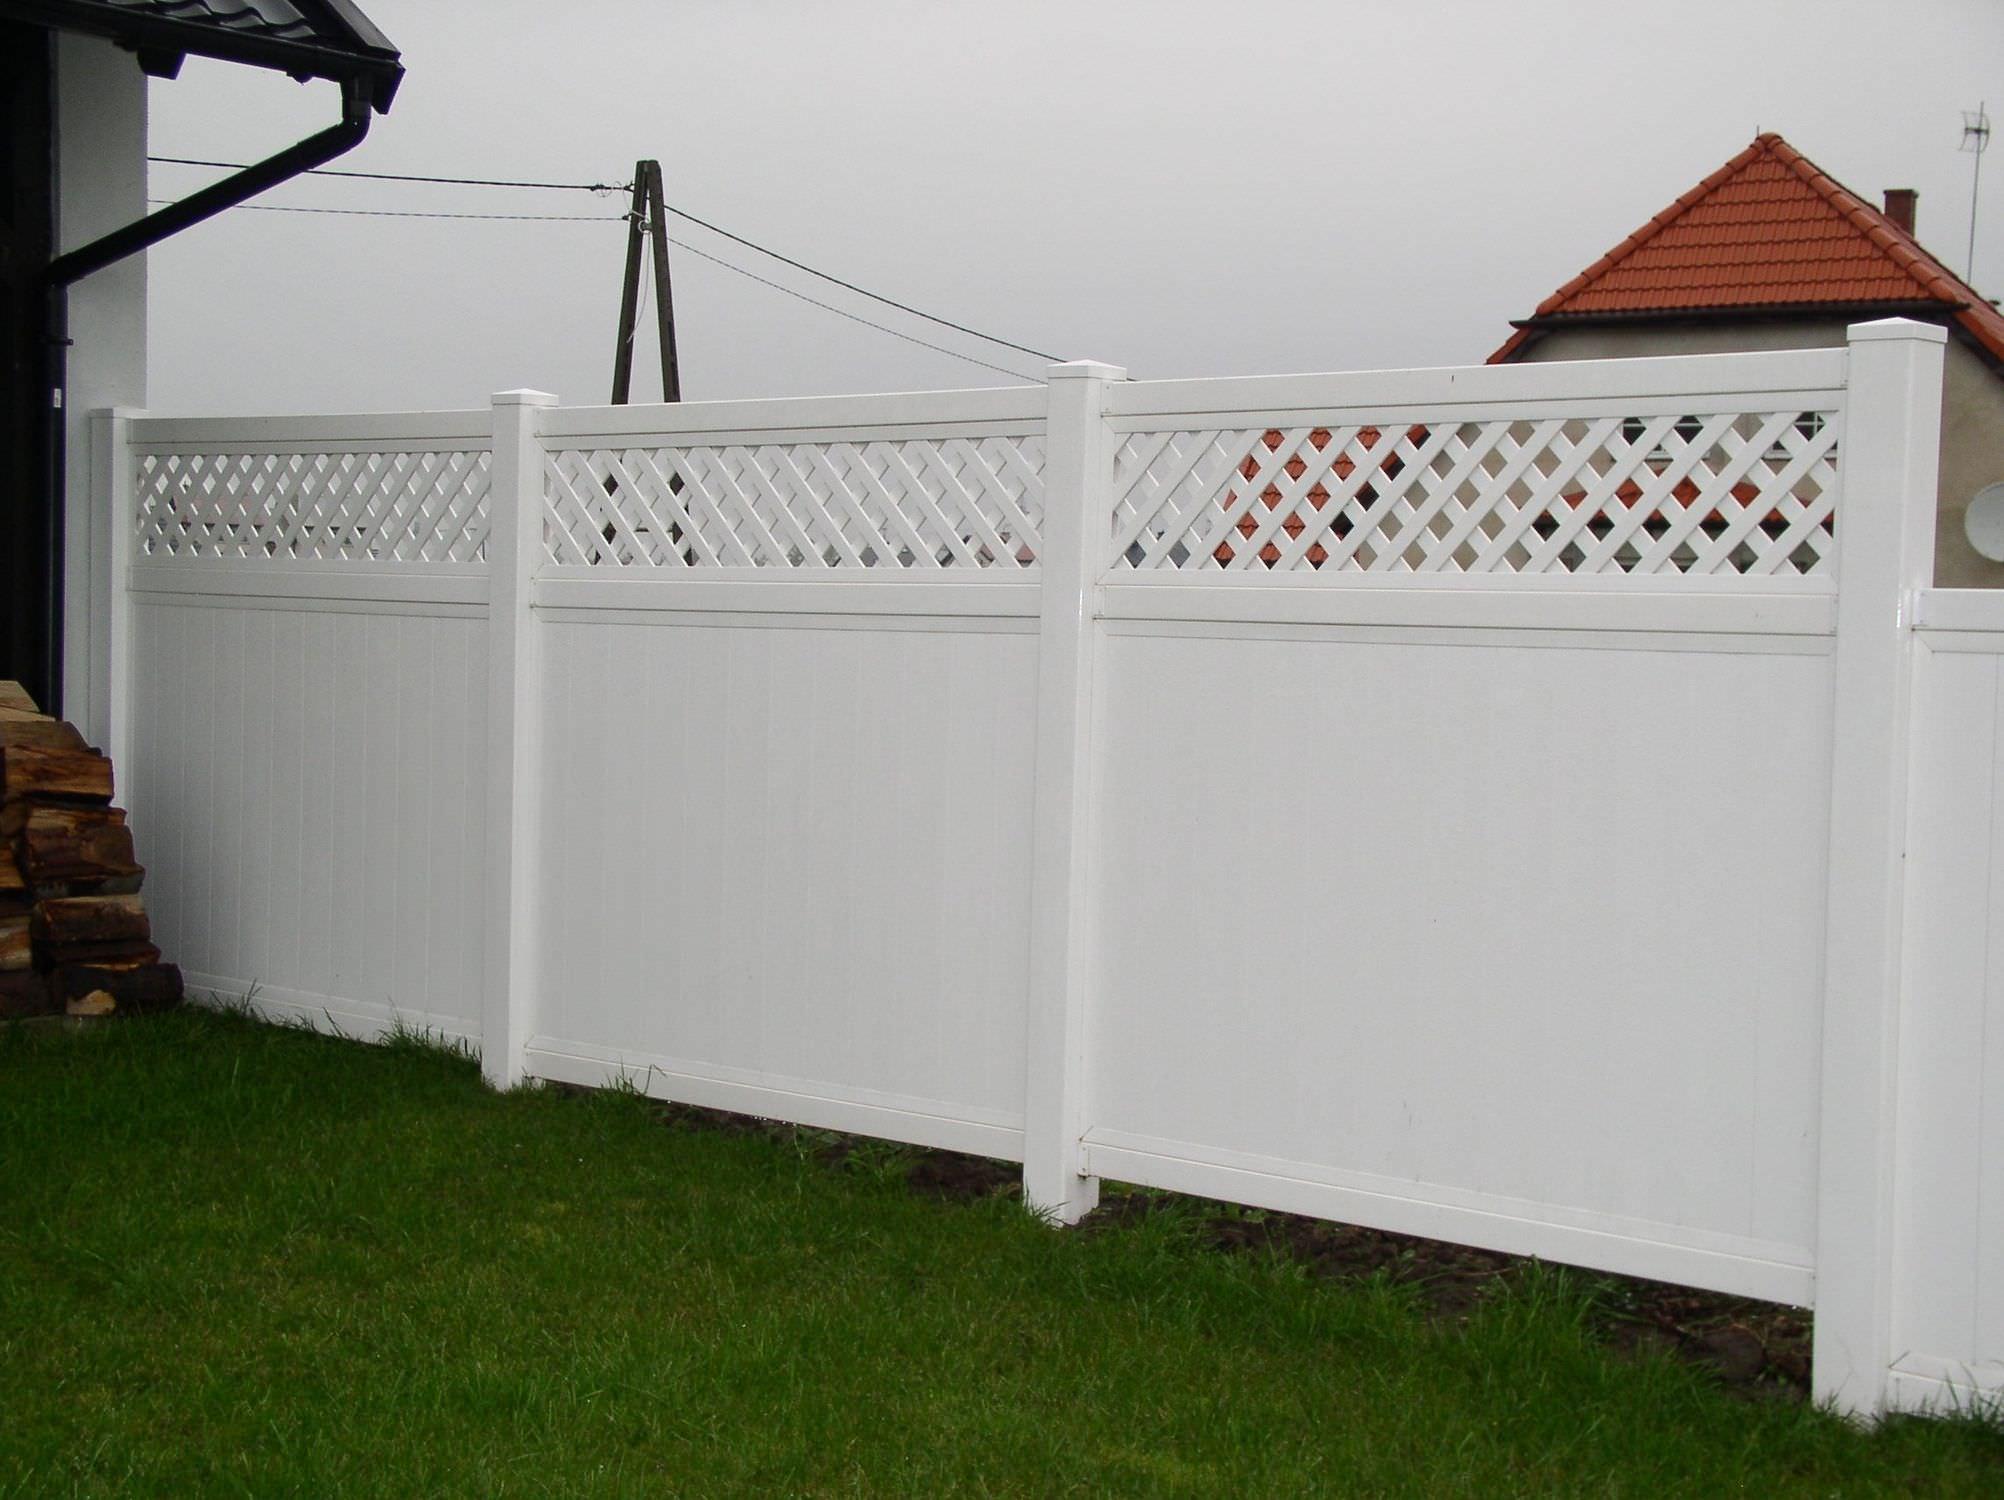 Recinzioni Per Giardino In Pvc.Garden Fence Hoarding Open Work Top Fence Pvc